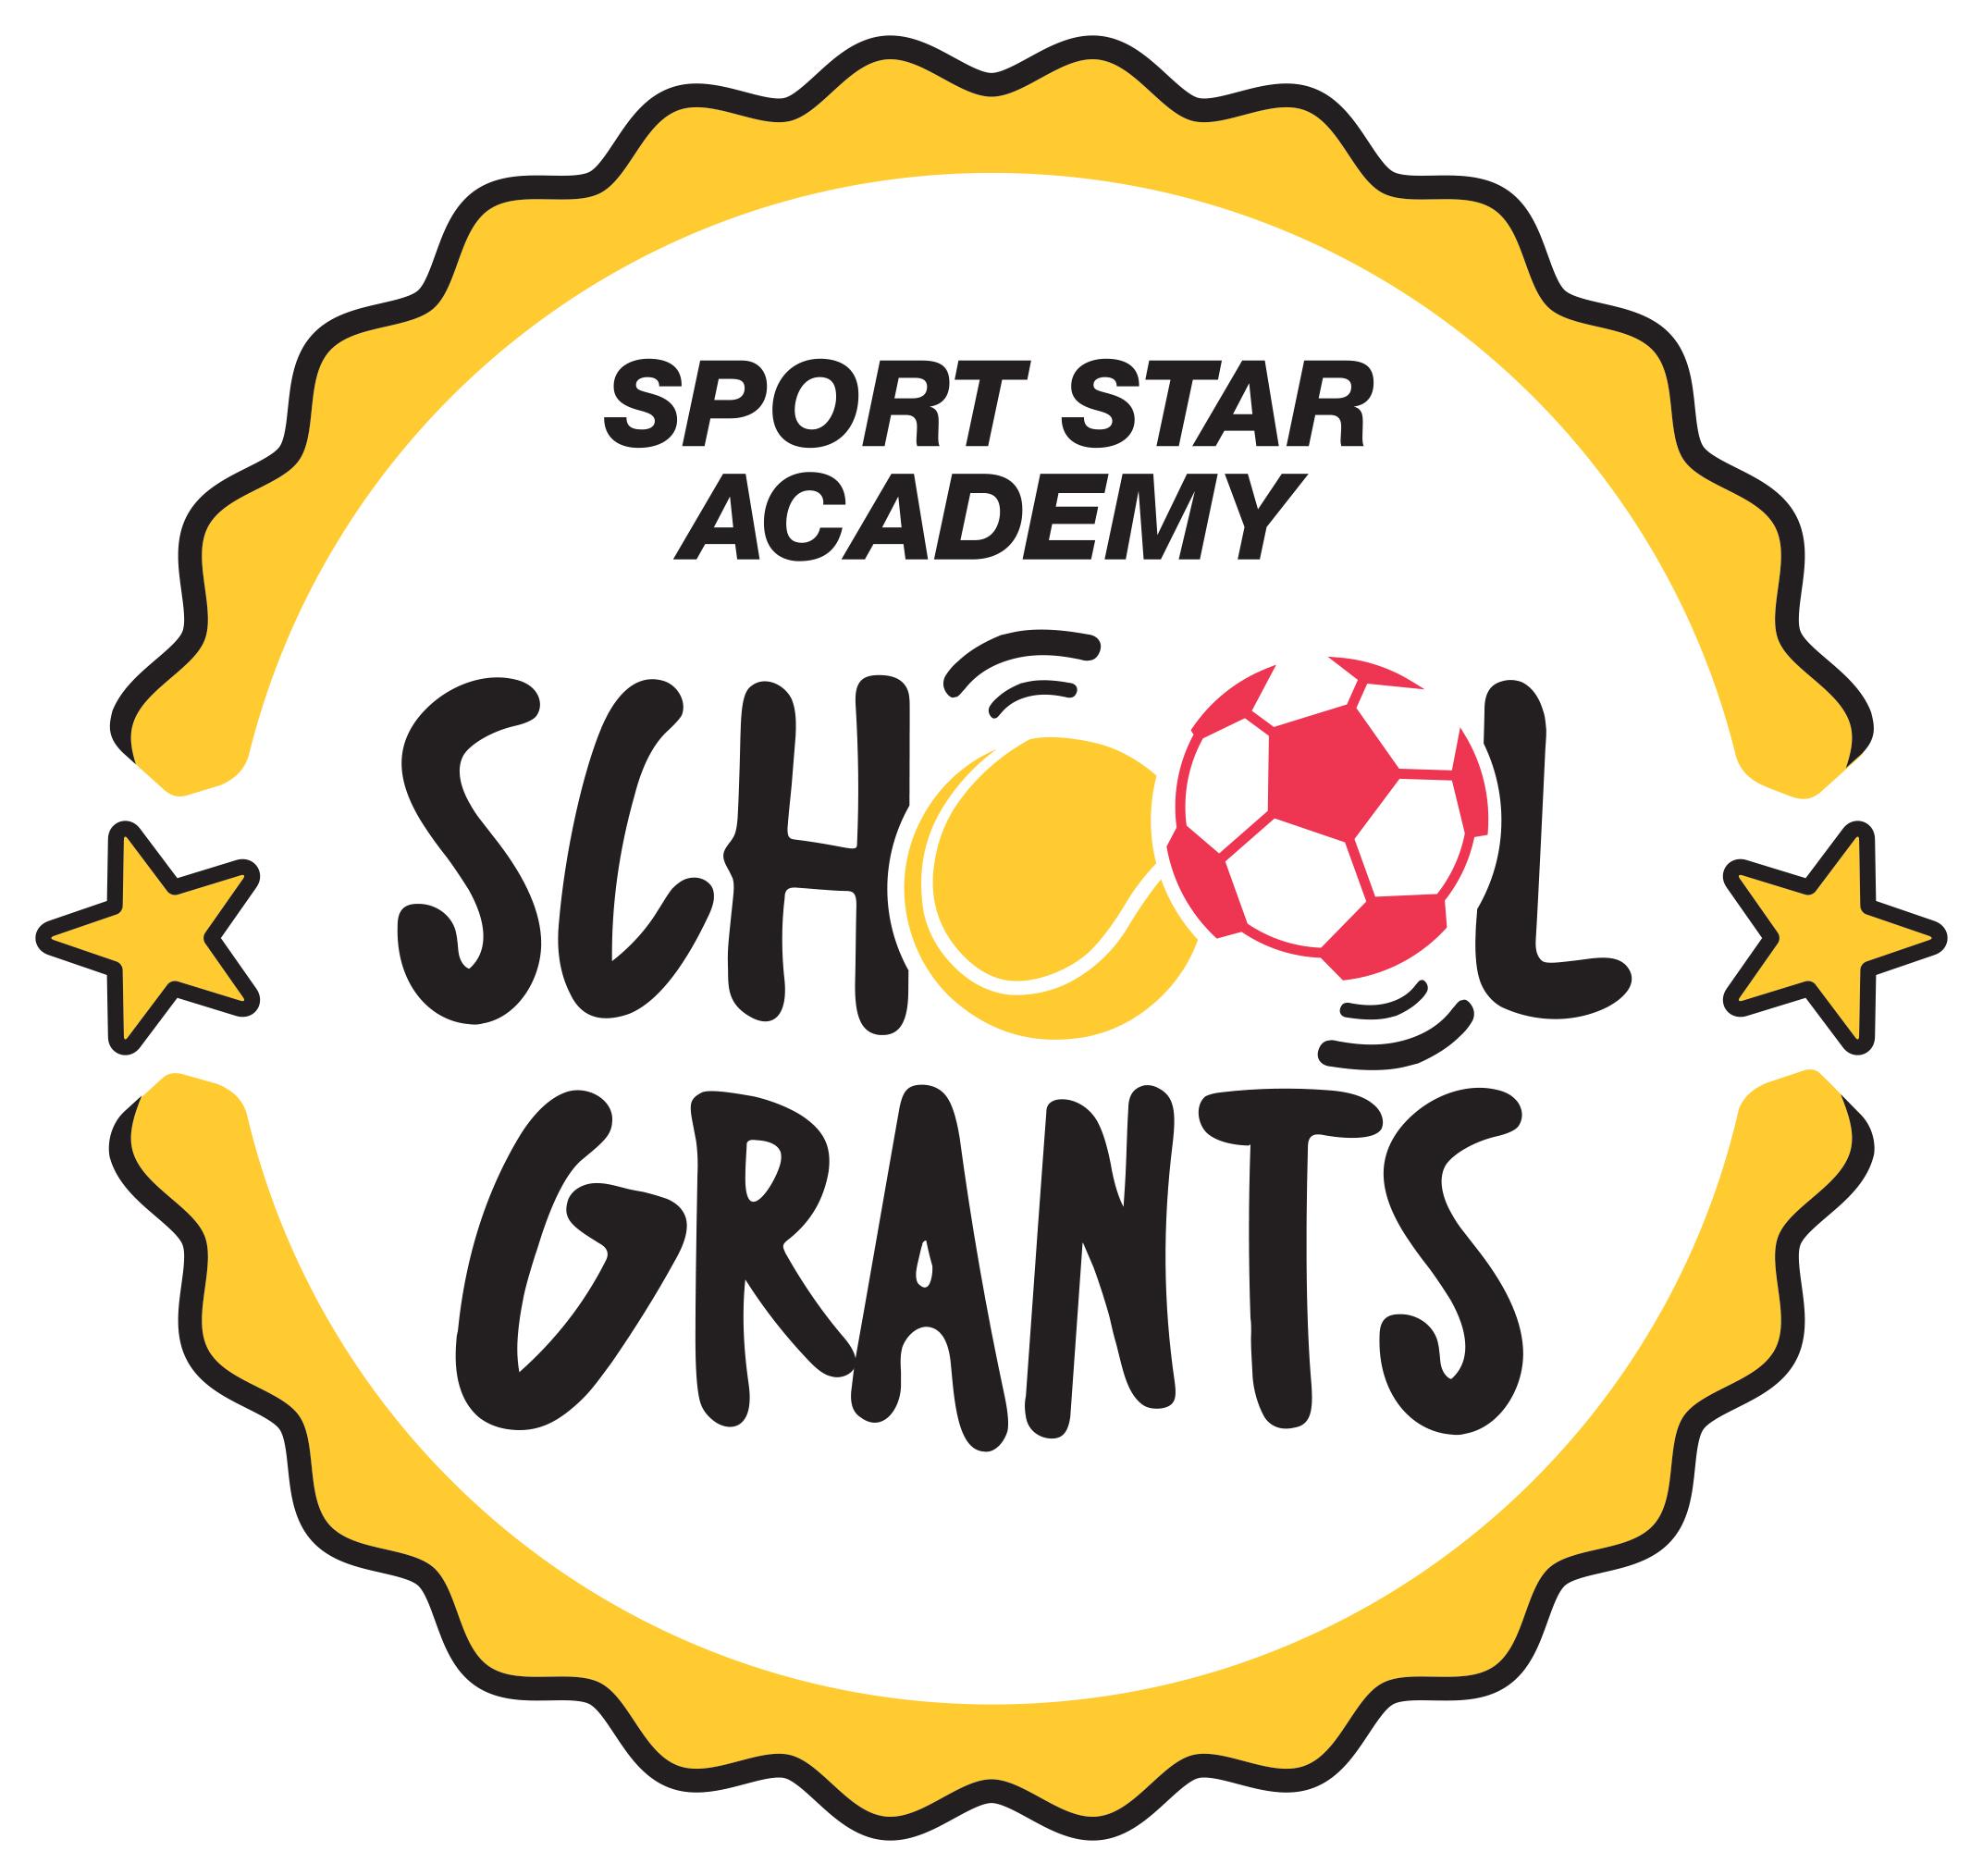 SSA School Grants LOGO_Colour.jpg